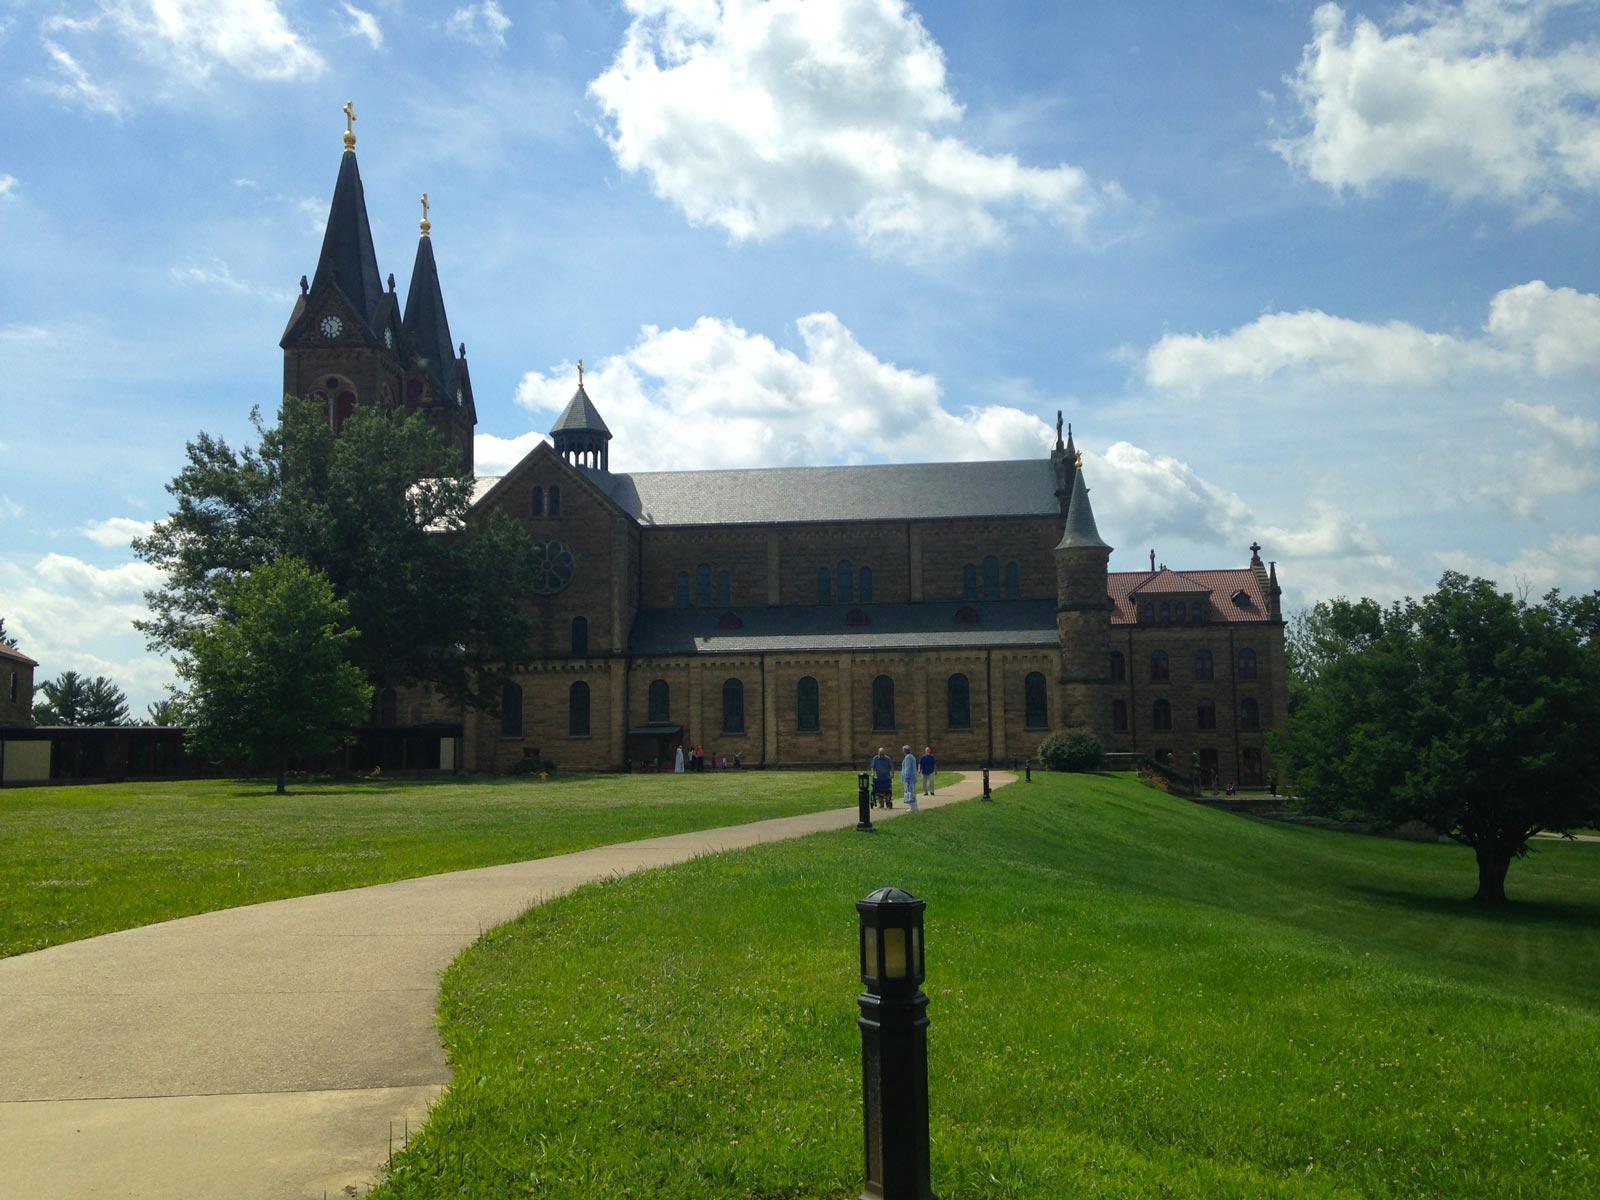 Exterior of Saint Meinrad Archabbey, St Meinrad, Indiana